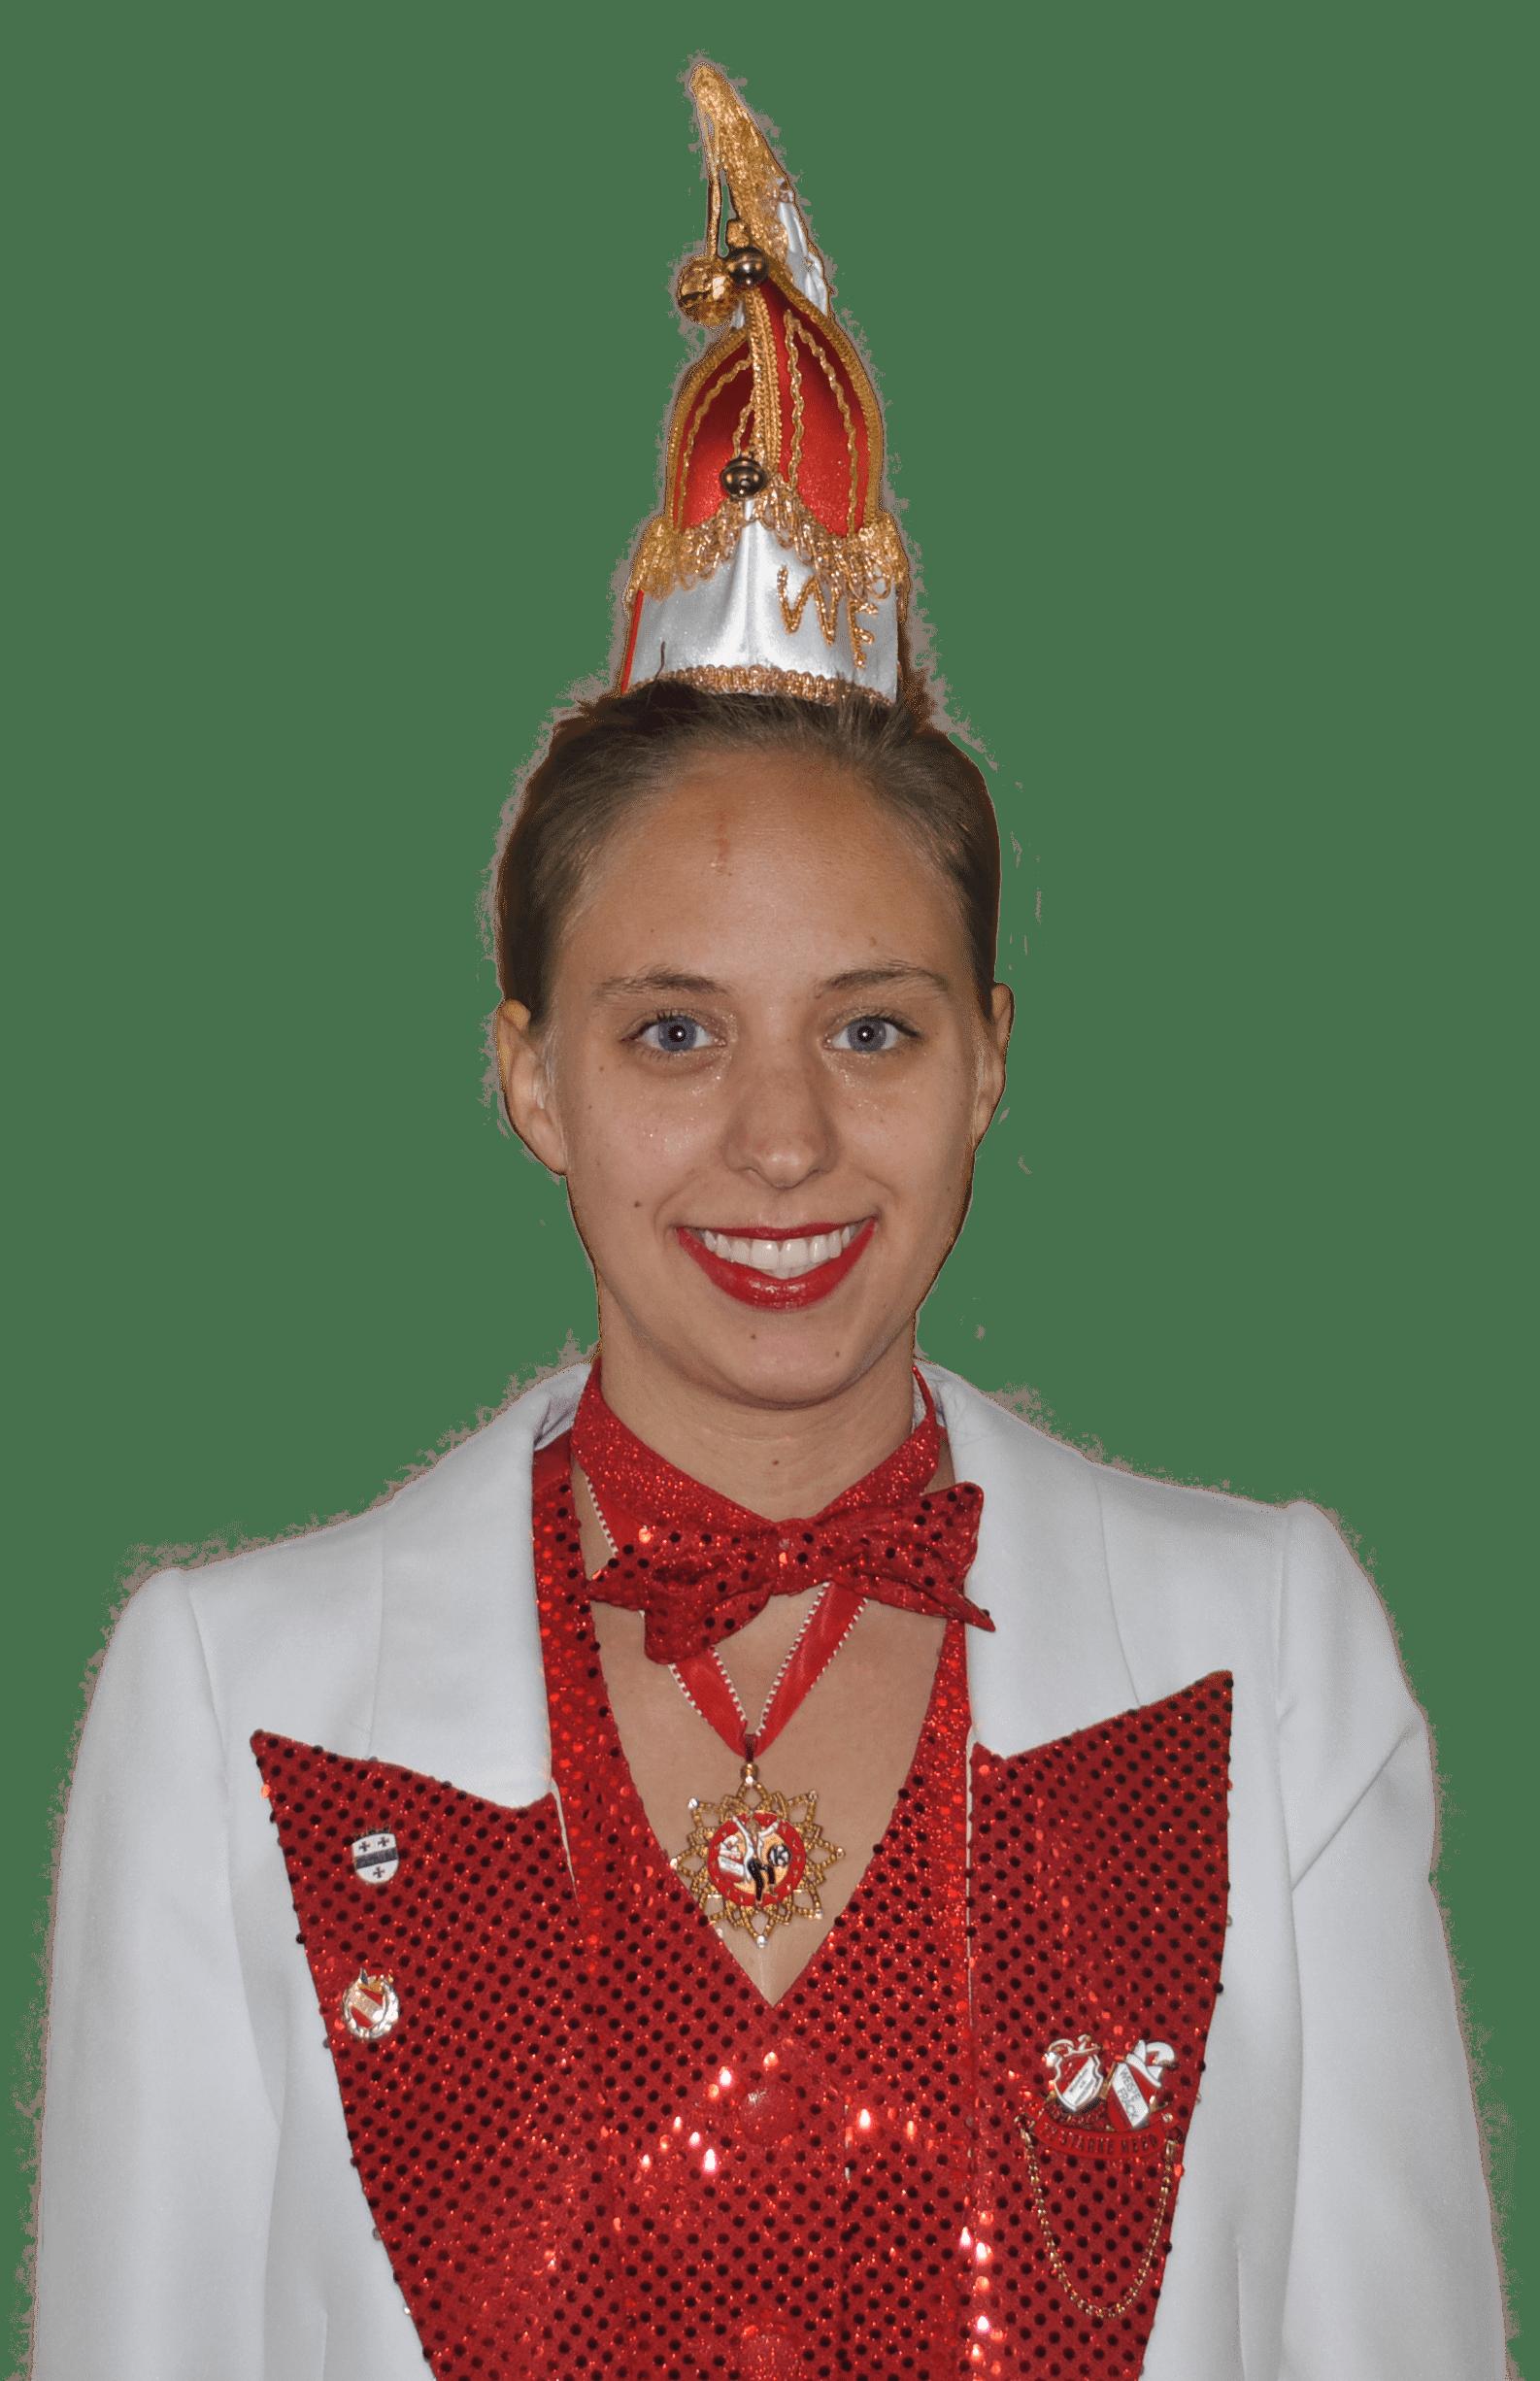 Jessica Trautmann